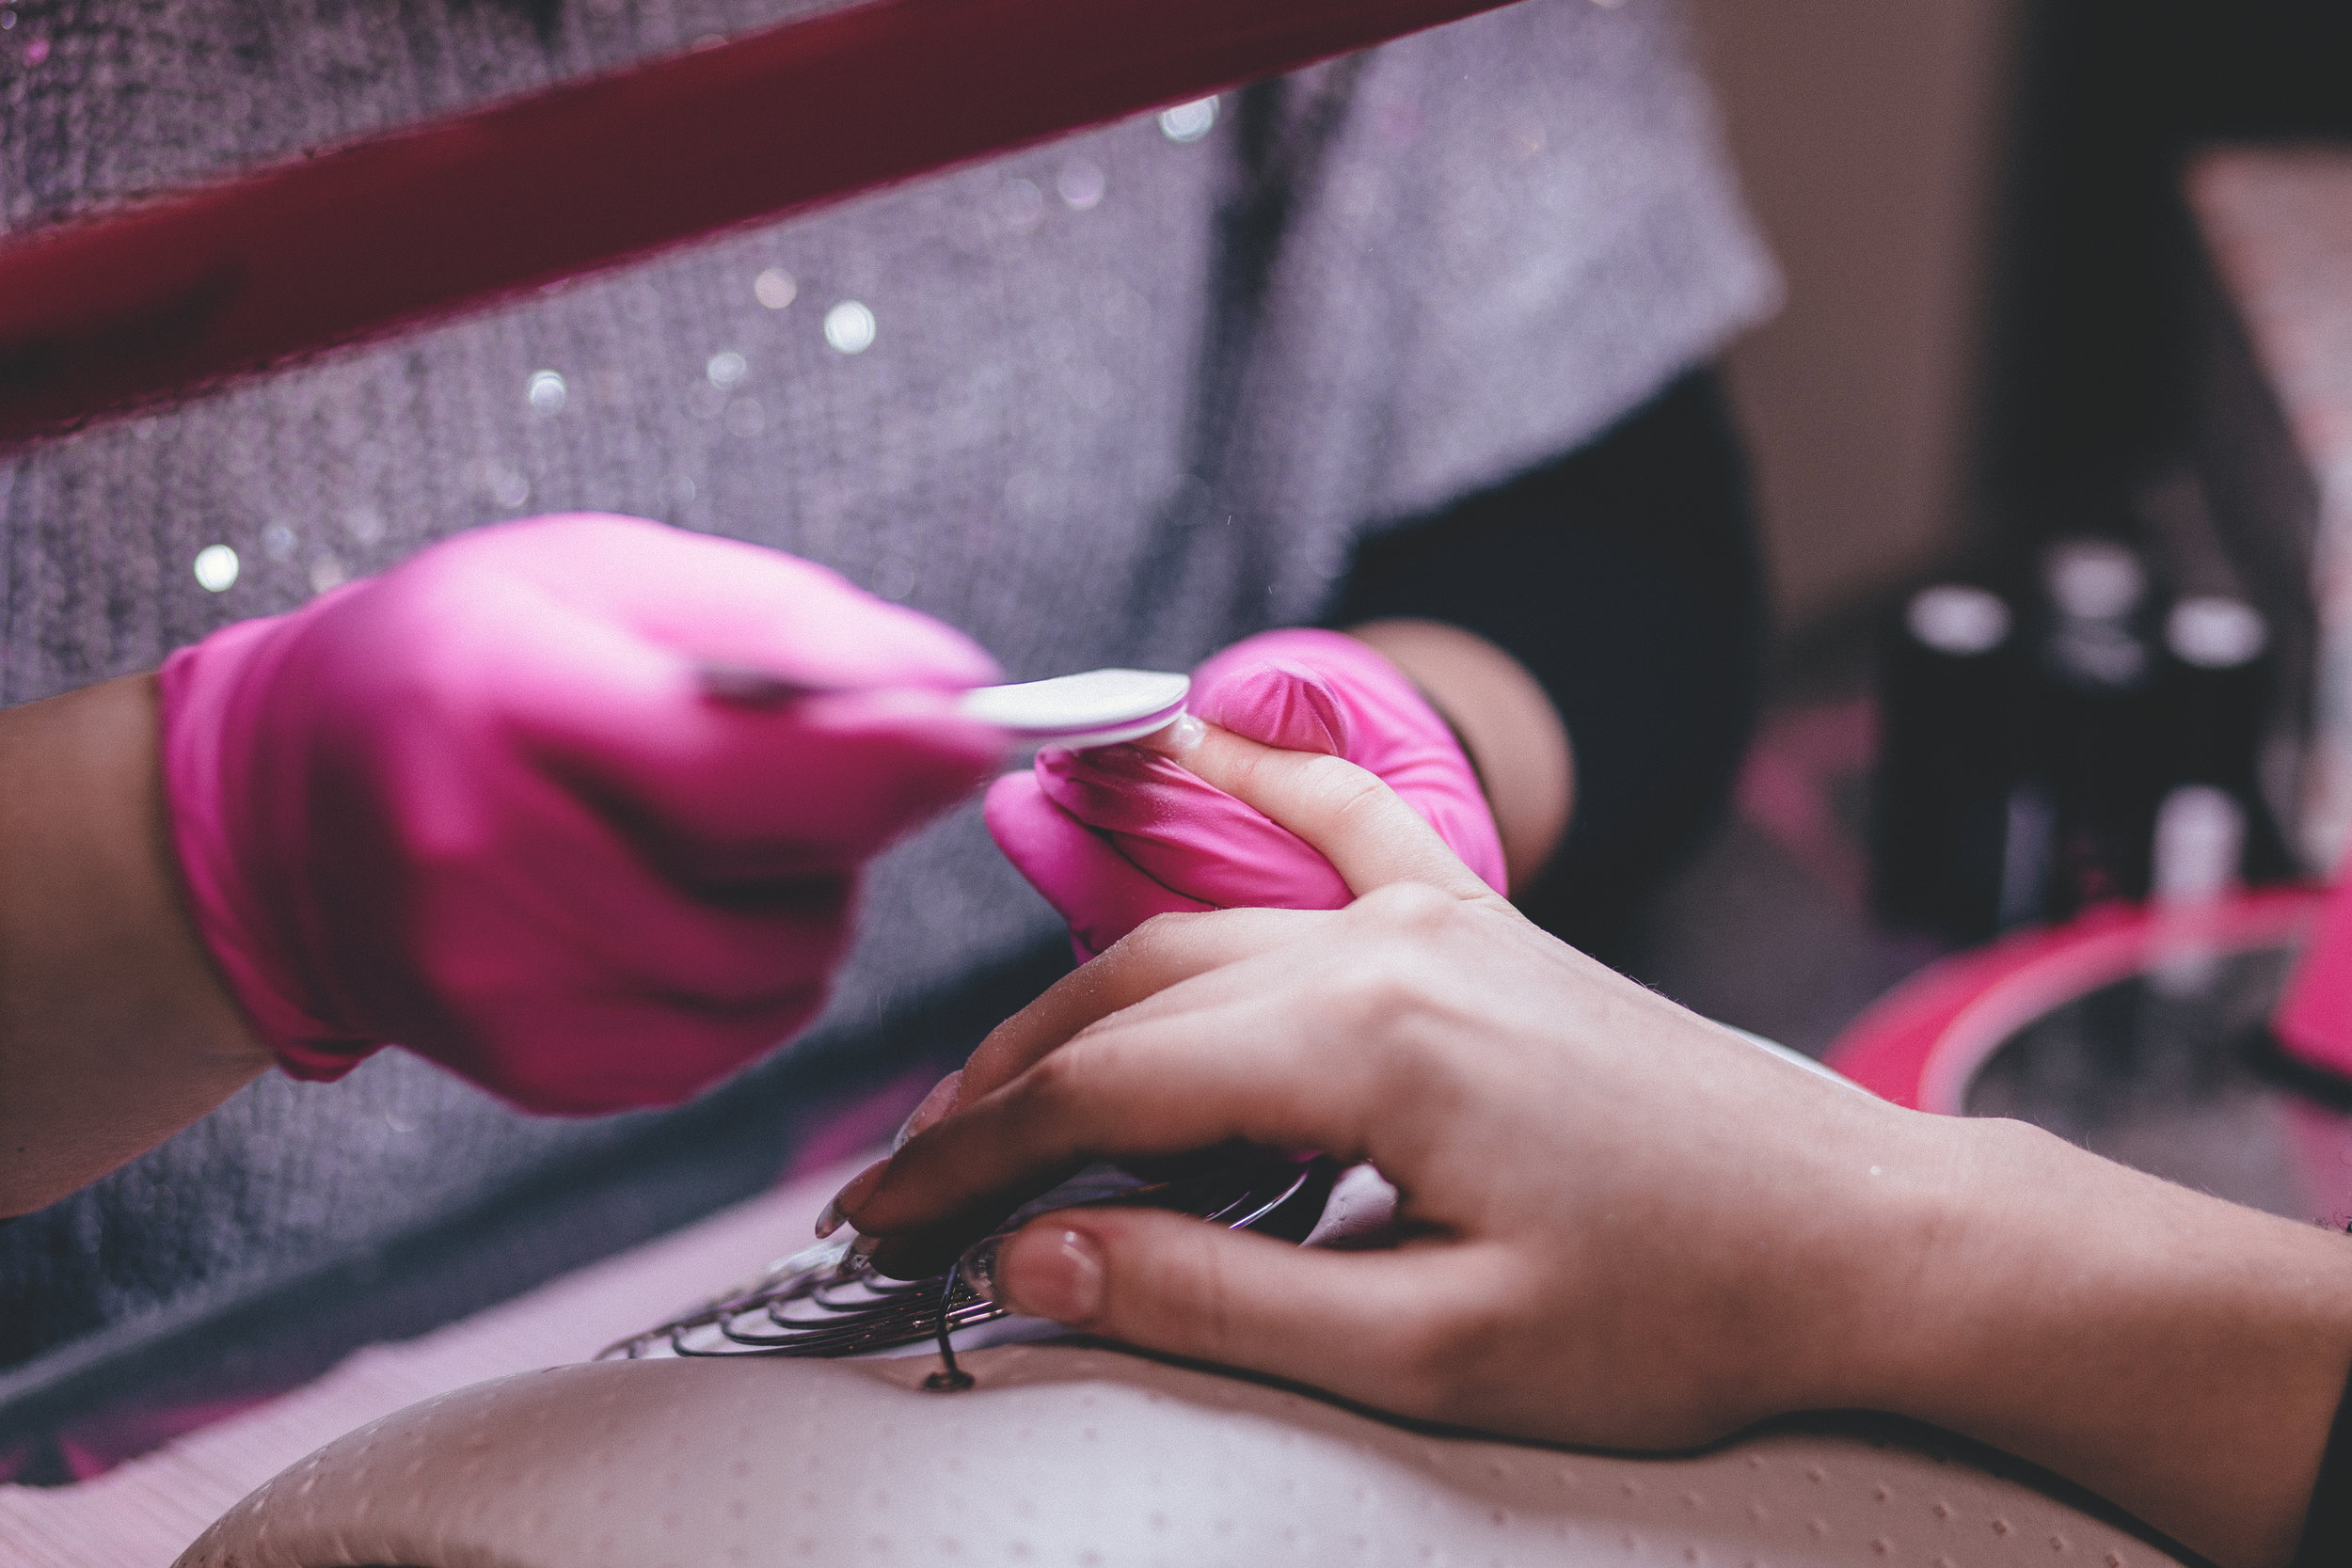 manicure pedicure - daVi nails - boerne texas - walmart